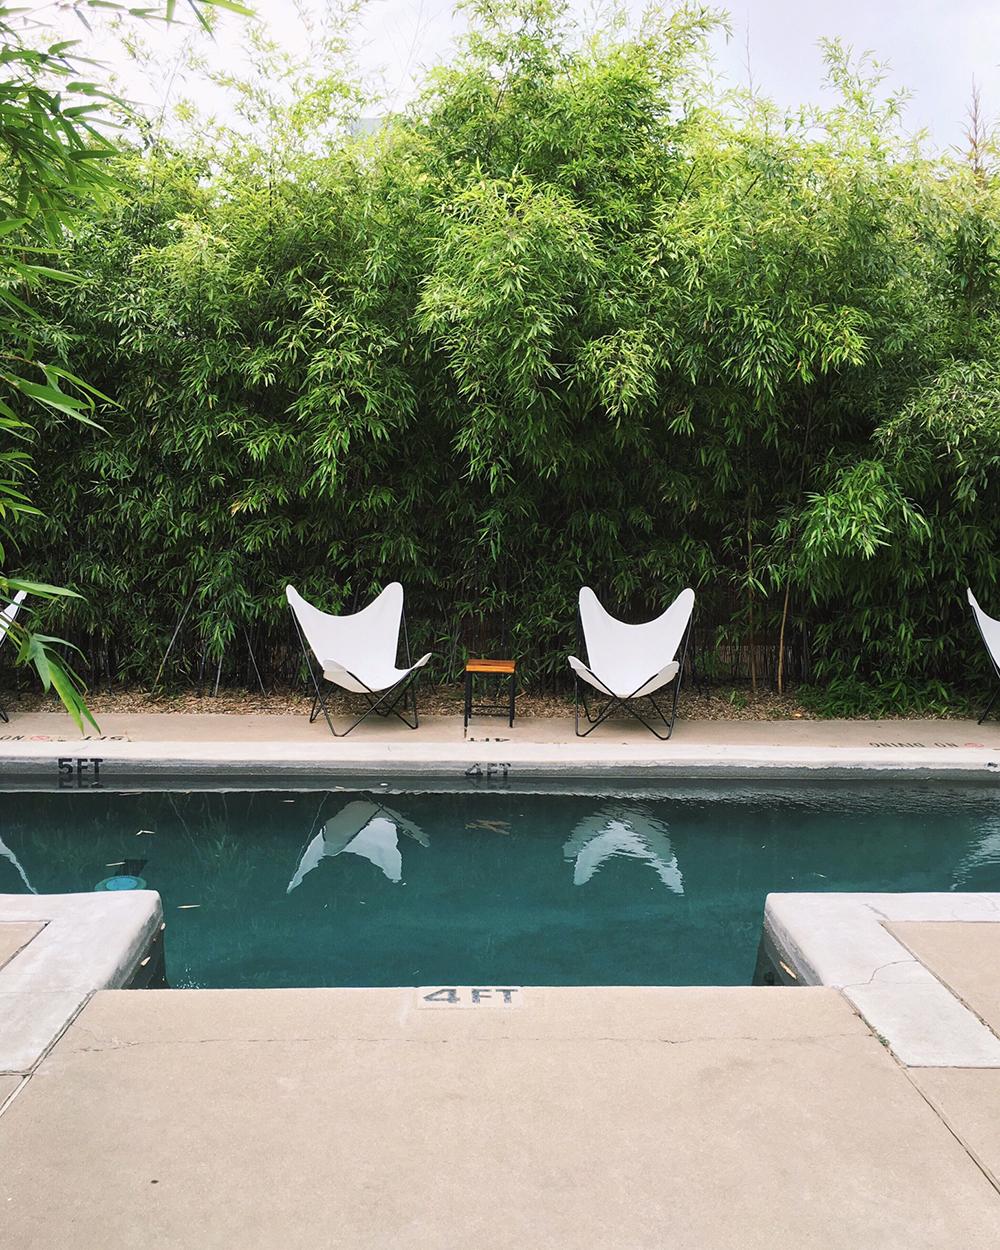 Hotel San Jose Review - Hotel San Jose pool Austin, TX